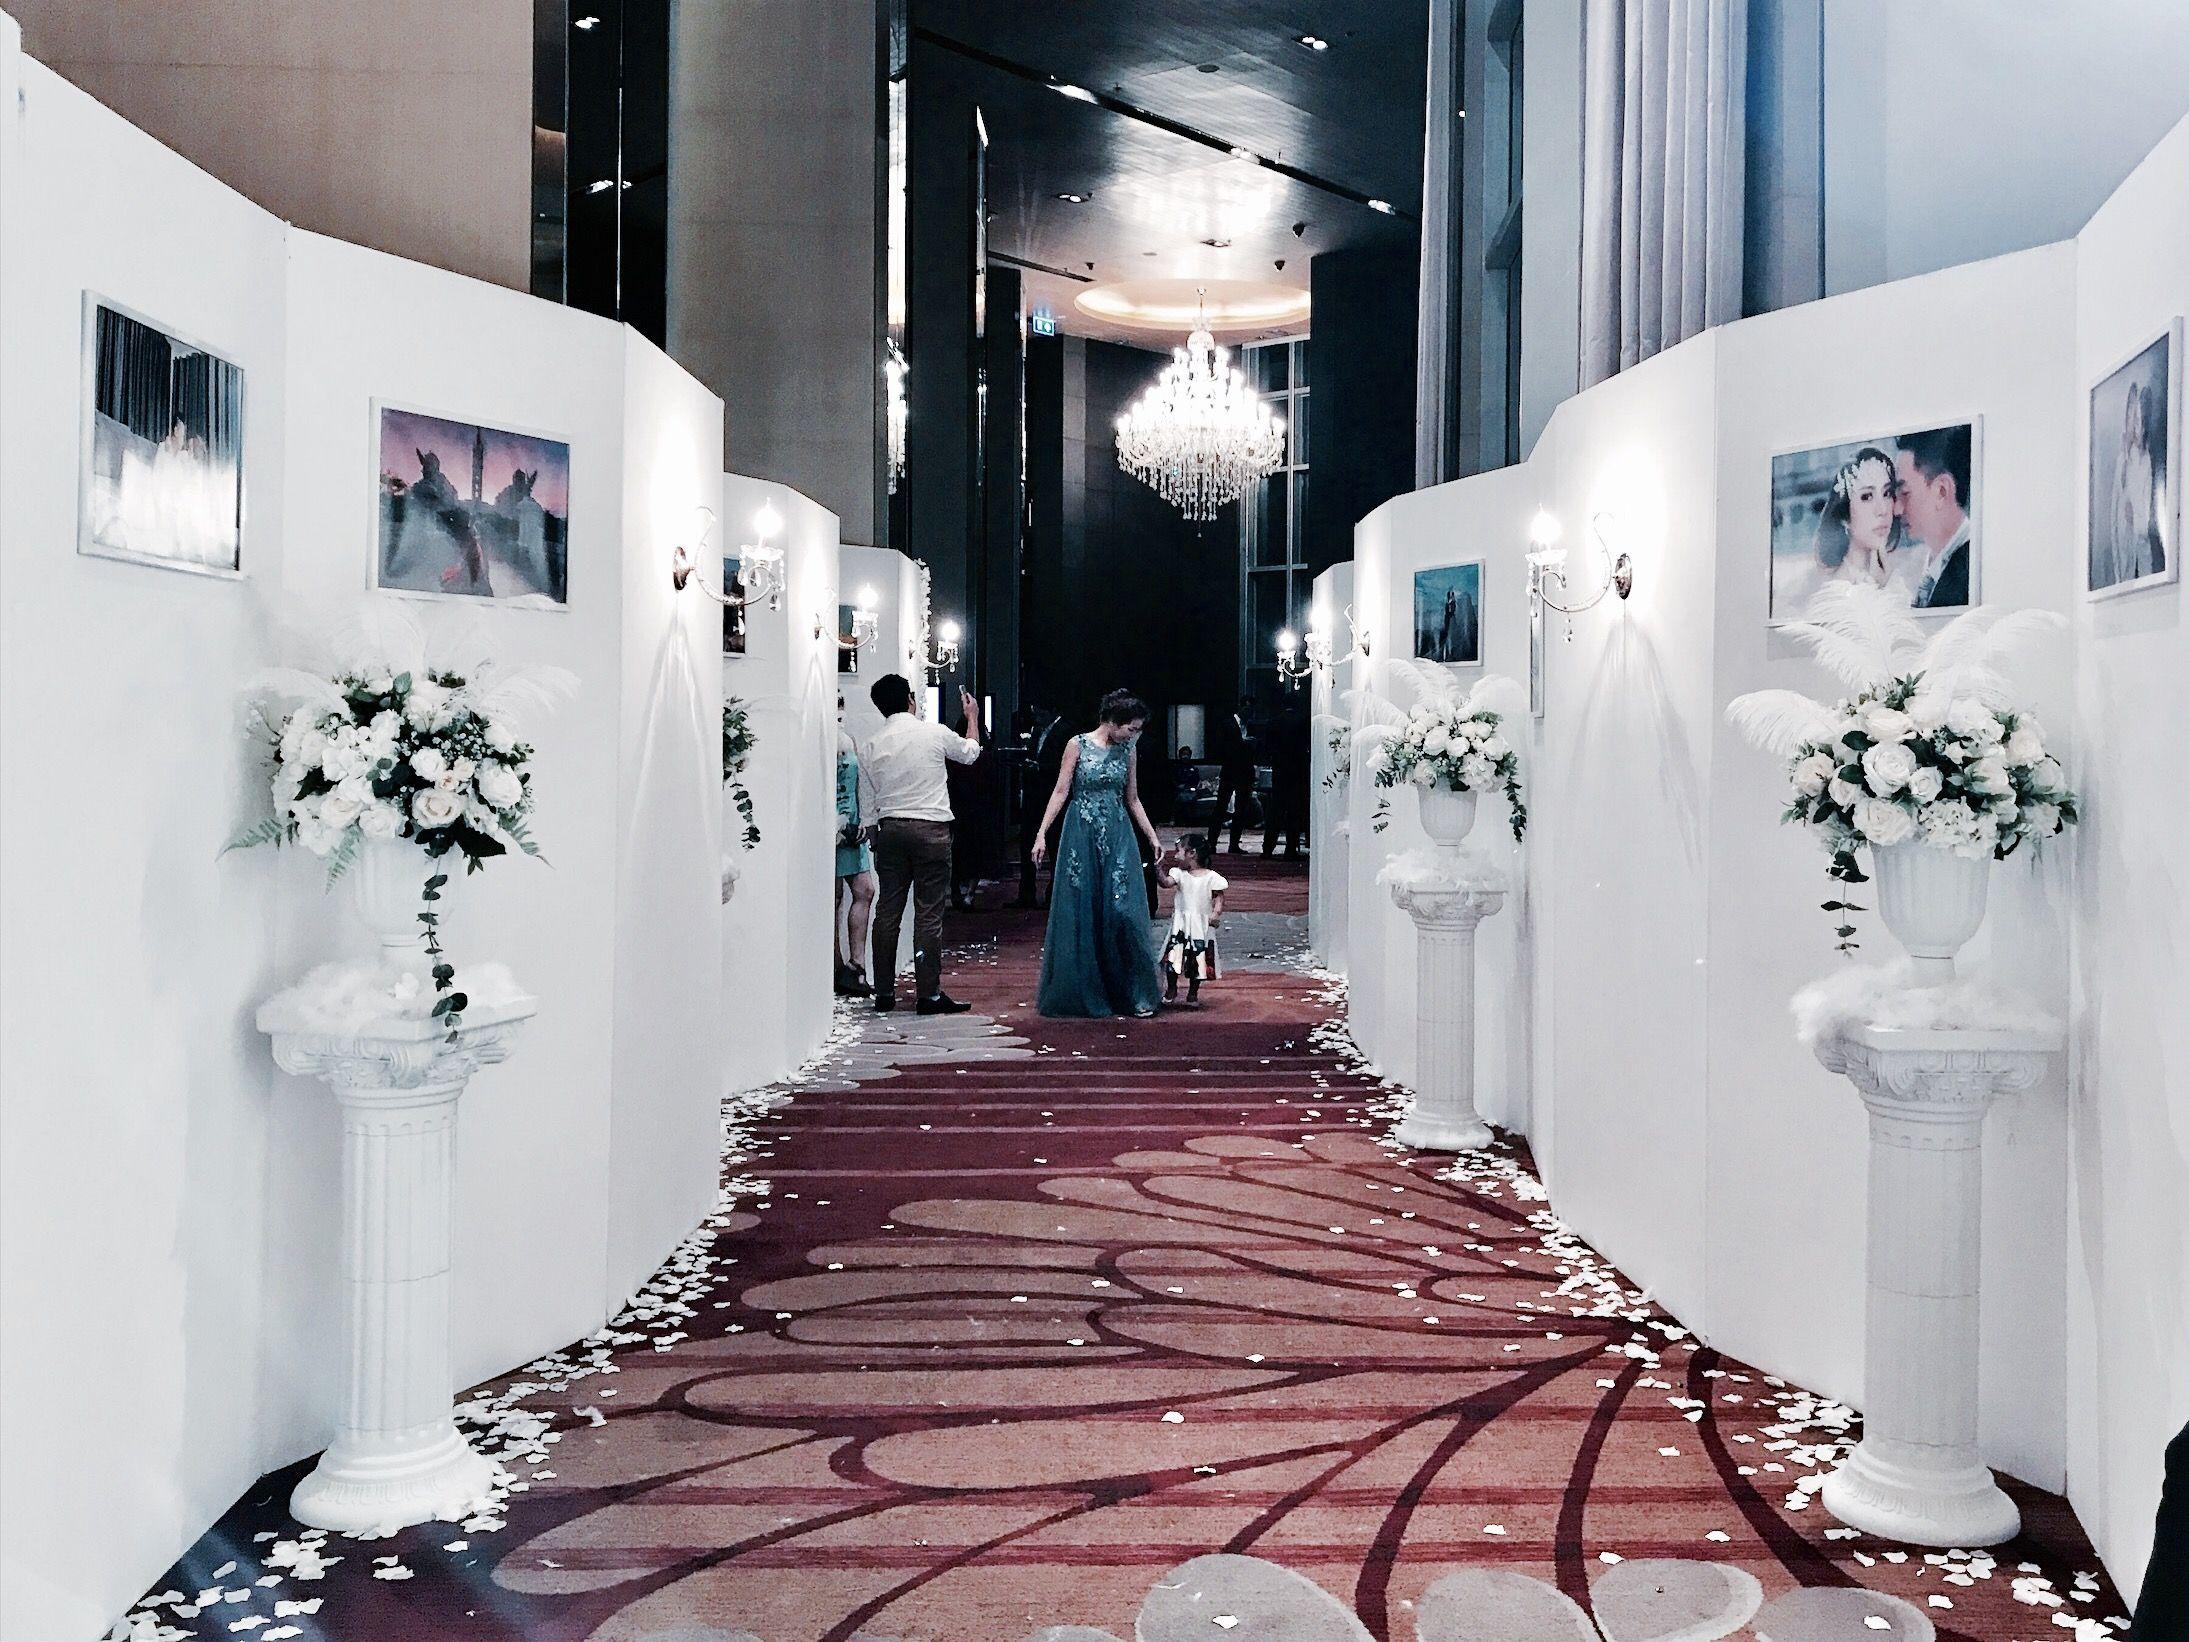 Wedding decorations stage backdrops october 2018 หนางาน idea  หนางาน in   Pinterest  Wedding Wedding